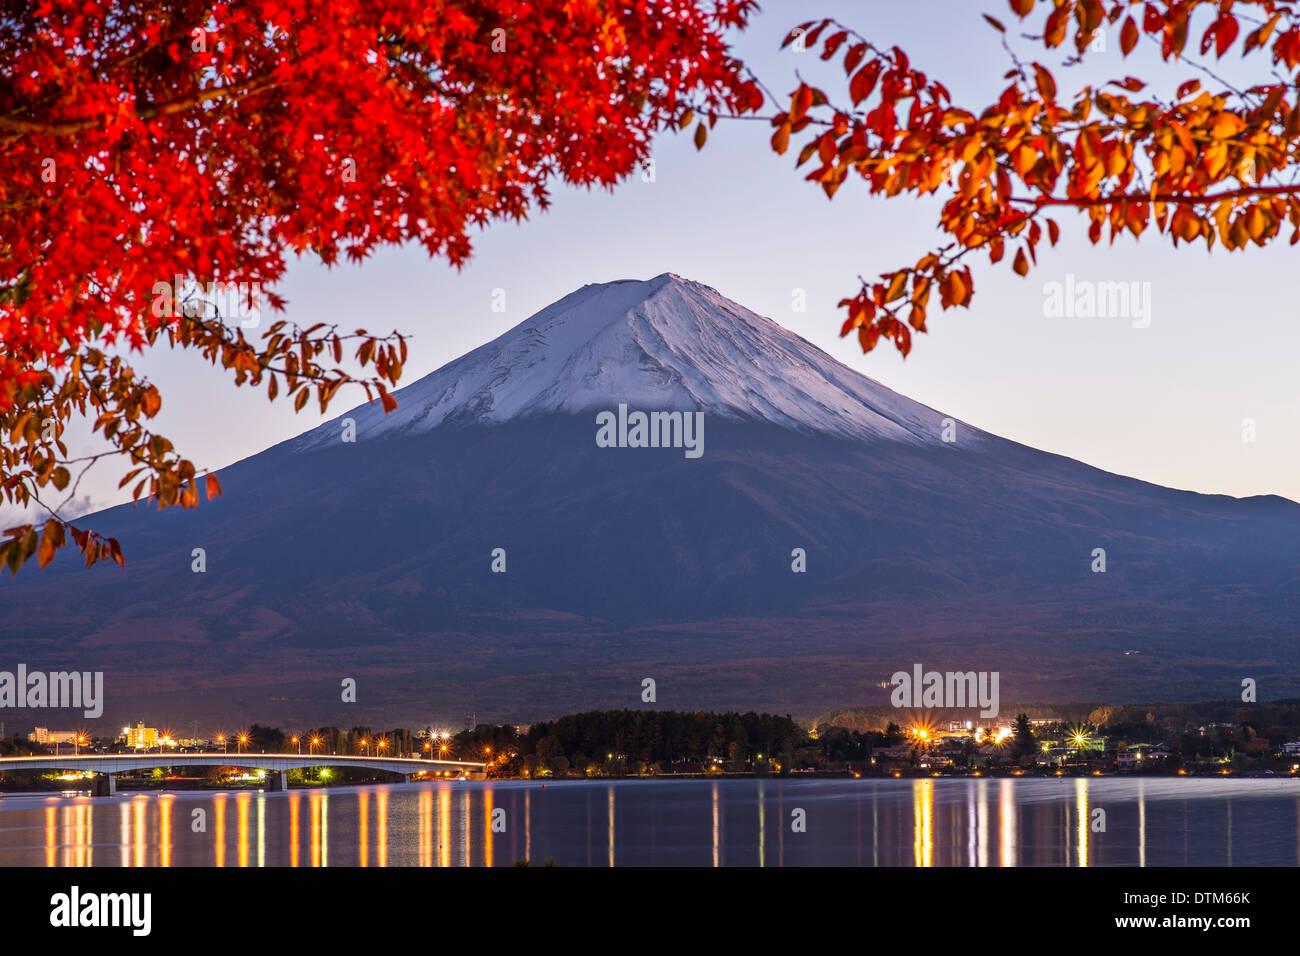 Fuji Mountain on Lake Kawaguchi in the fall season at dusk. - Stock Image